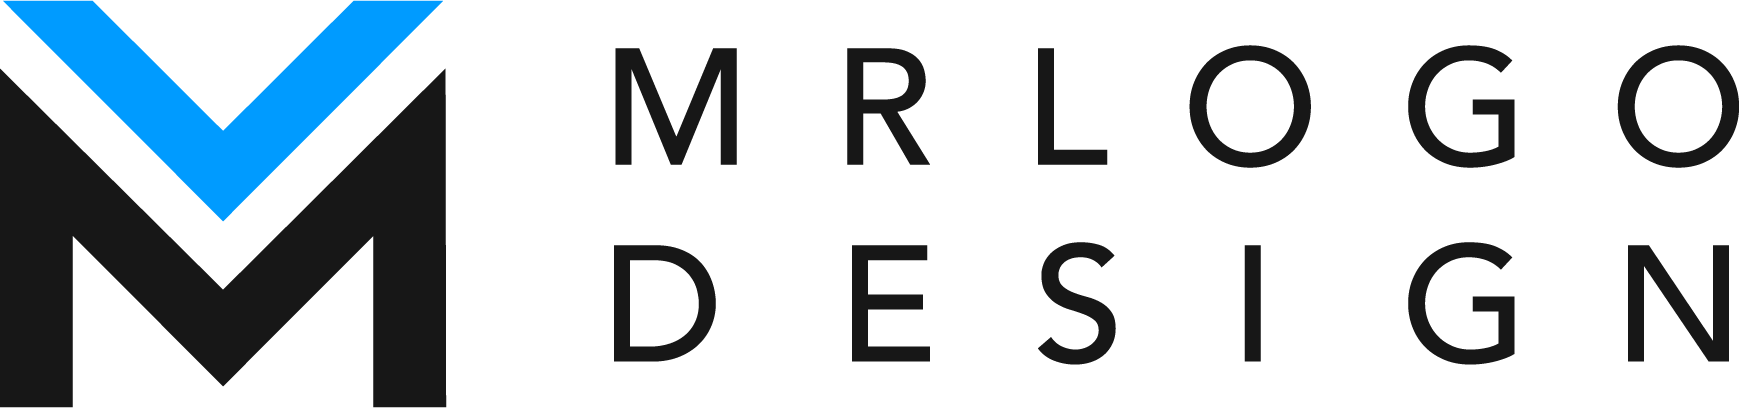 Mrlogo--商标先生地址和联系方式